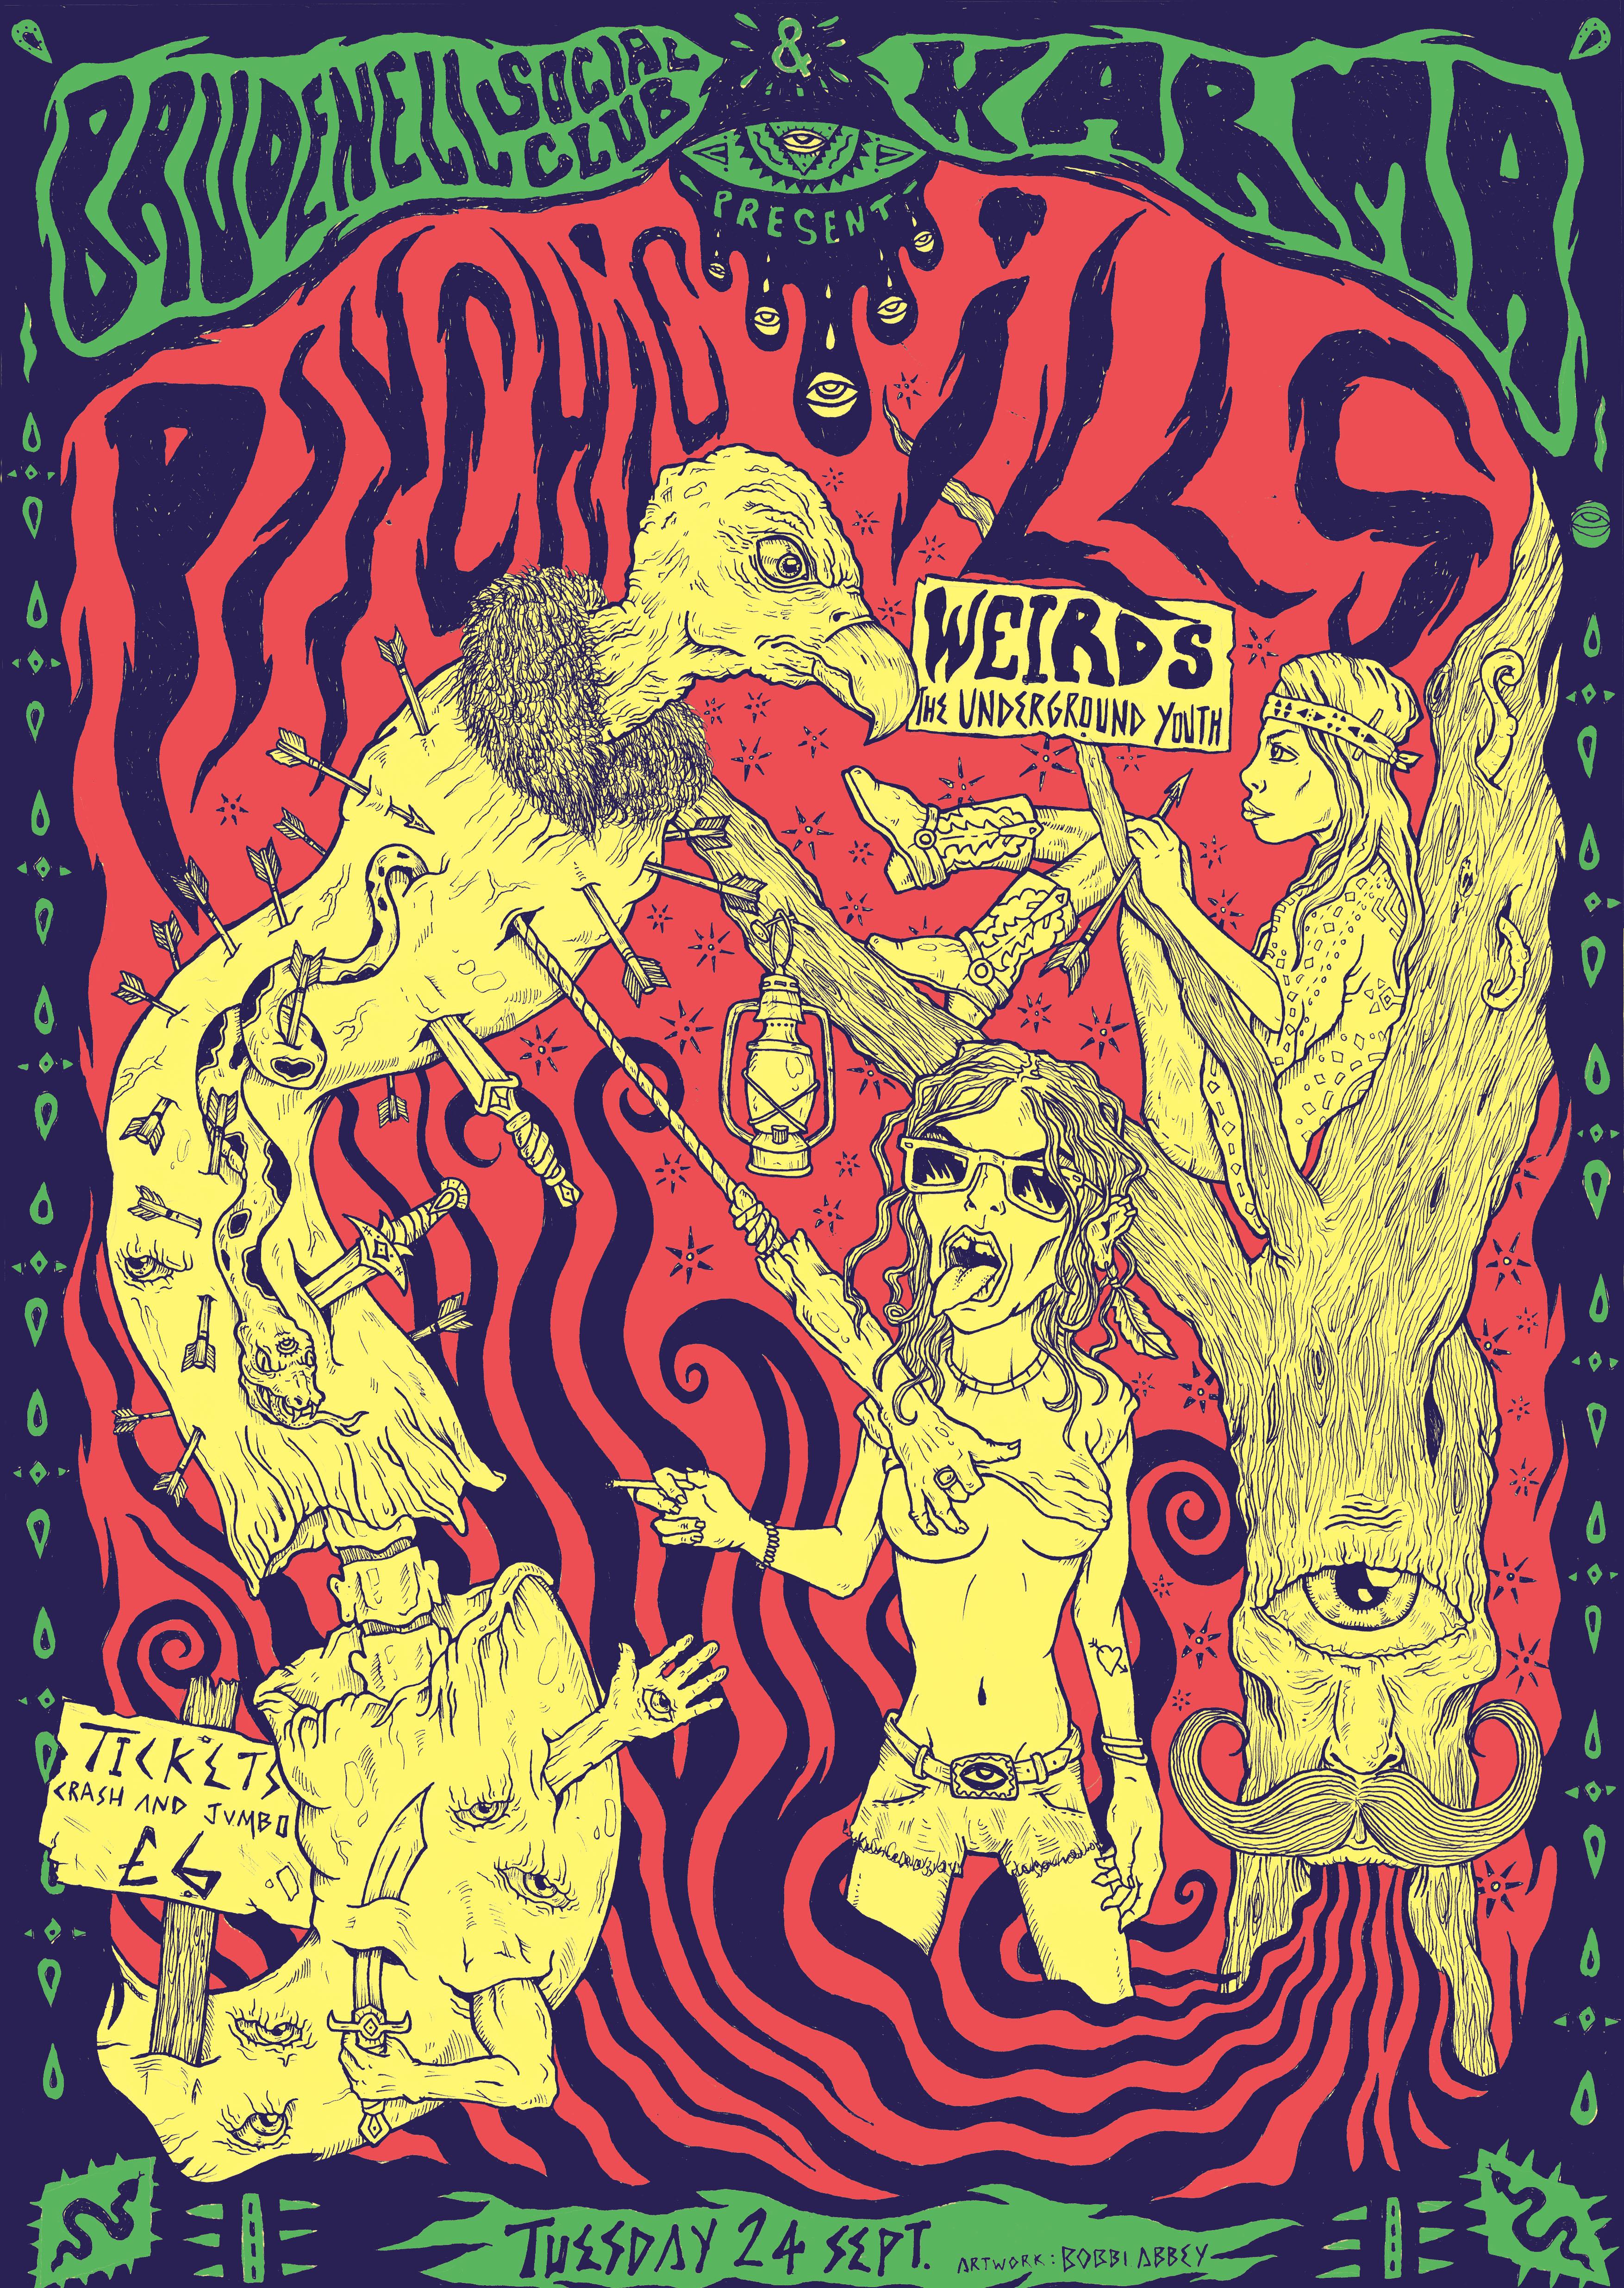 PSYCHIC ILLS poster